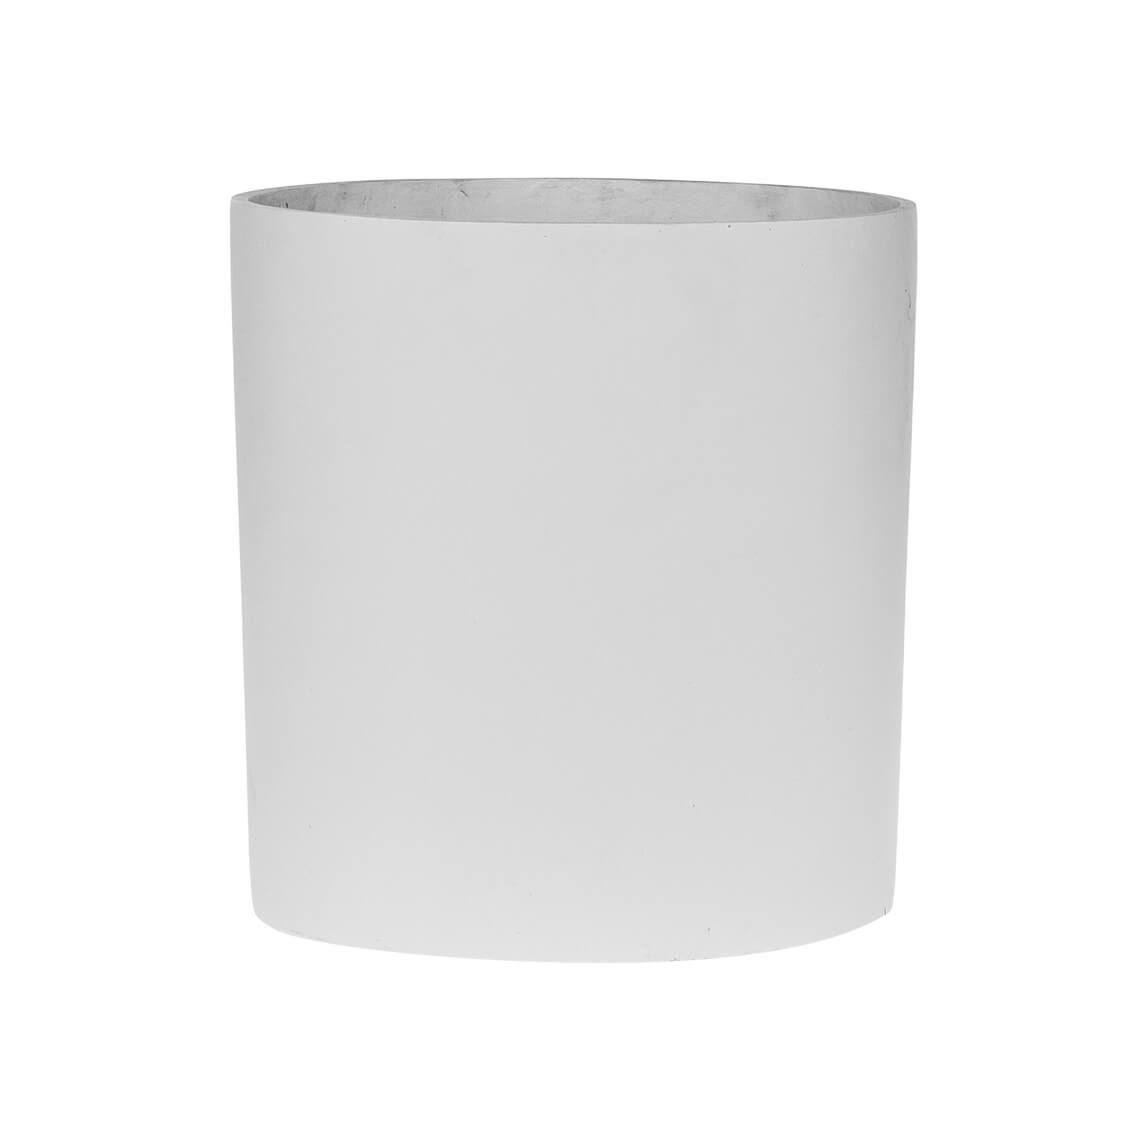 Akiyo Small Planter Size W 26cm x D 26cm x H 26cm in White 50% Poly Resin/50% Stone Powder Freedom